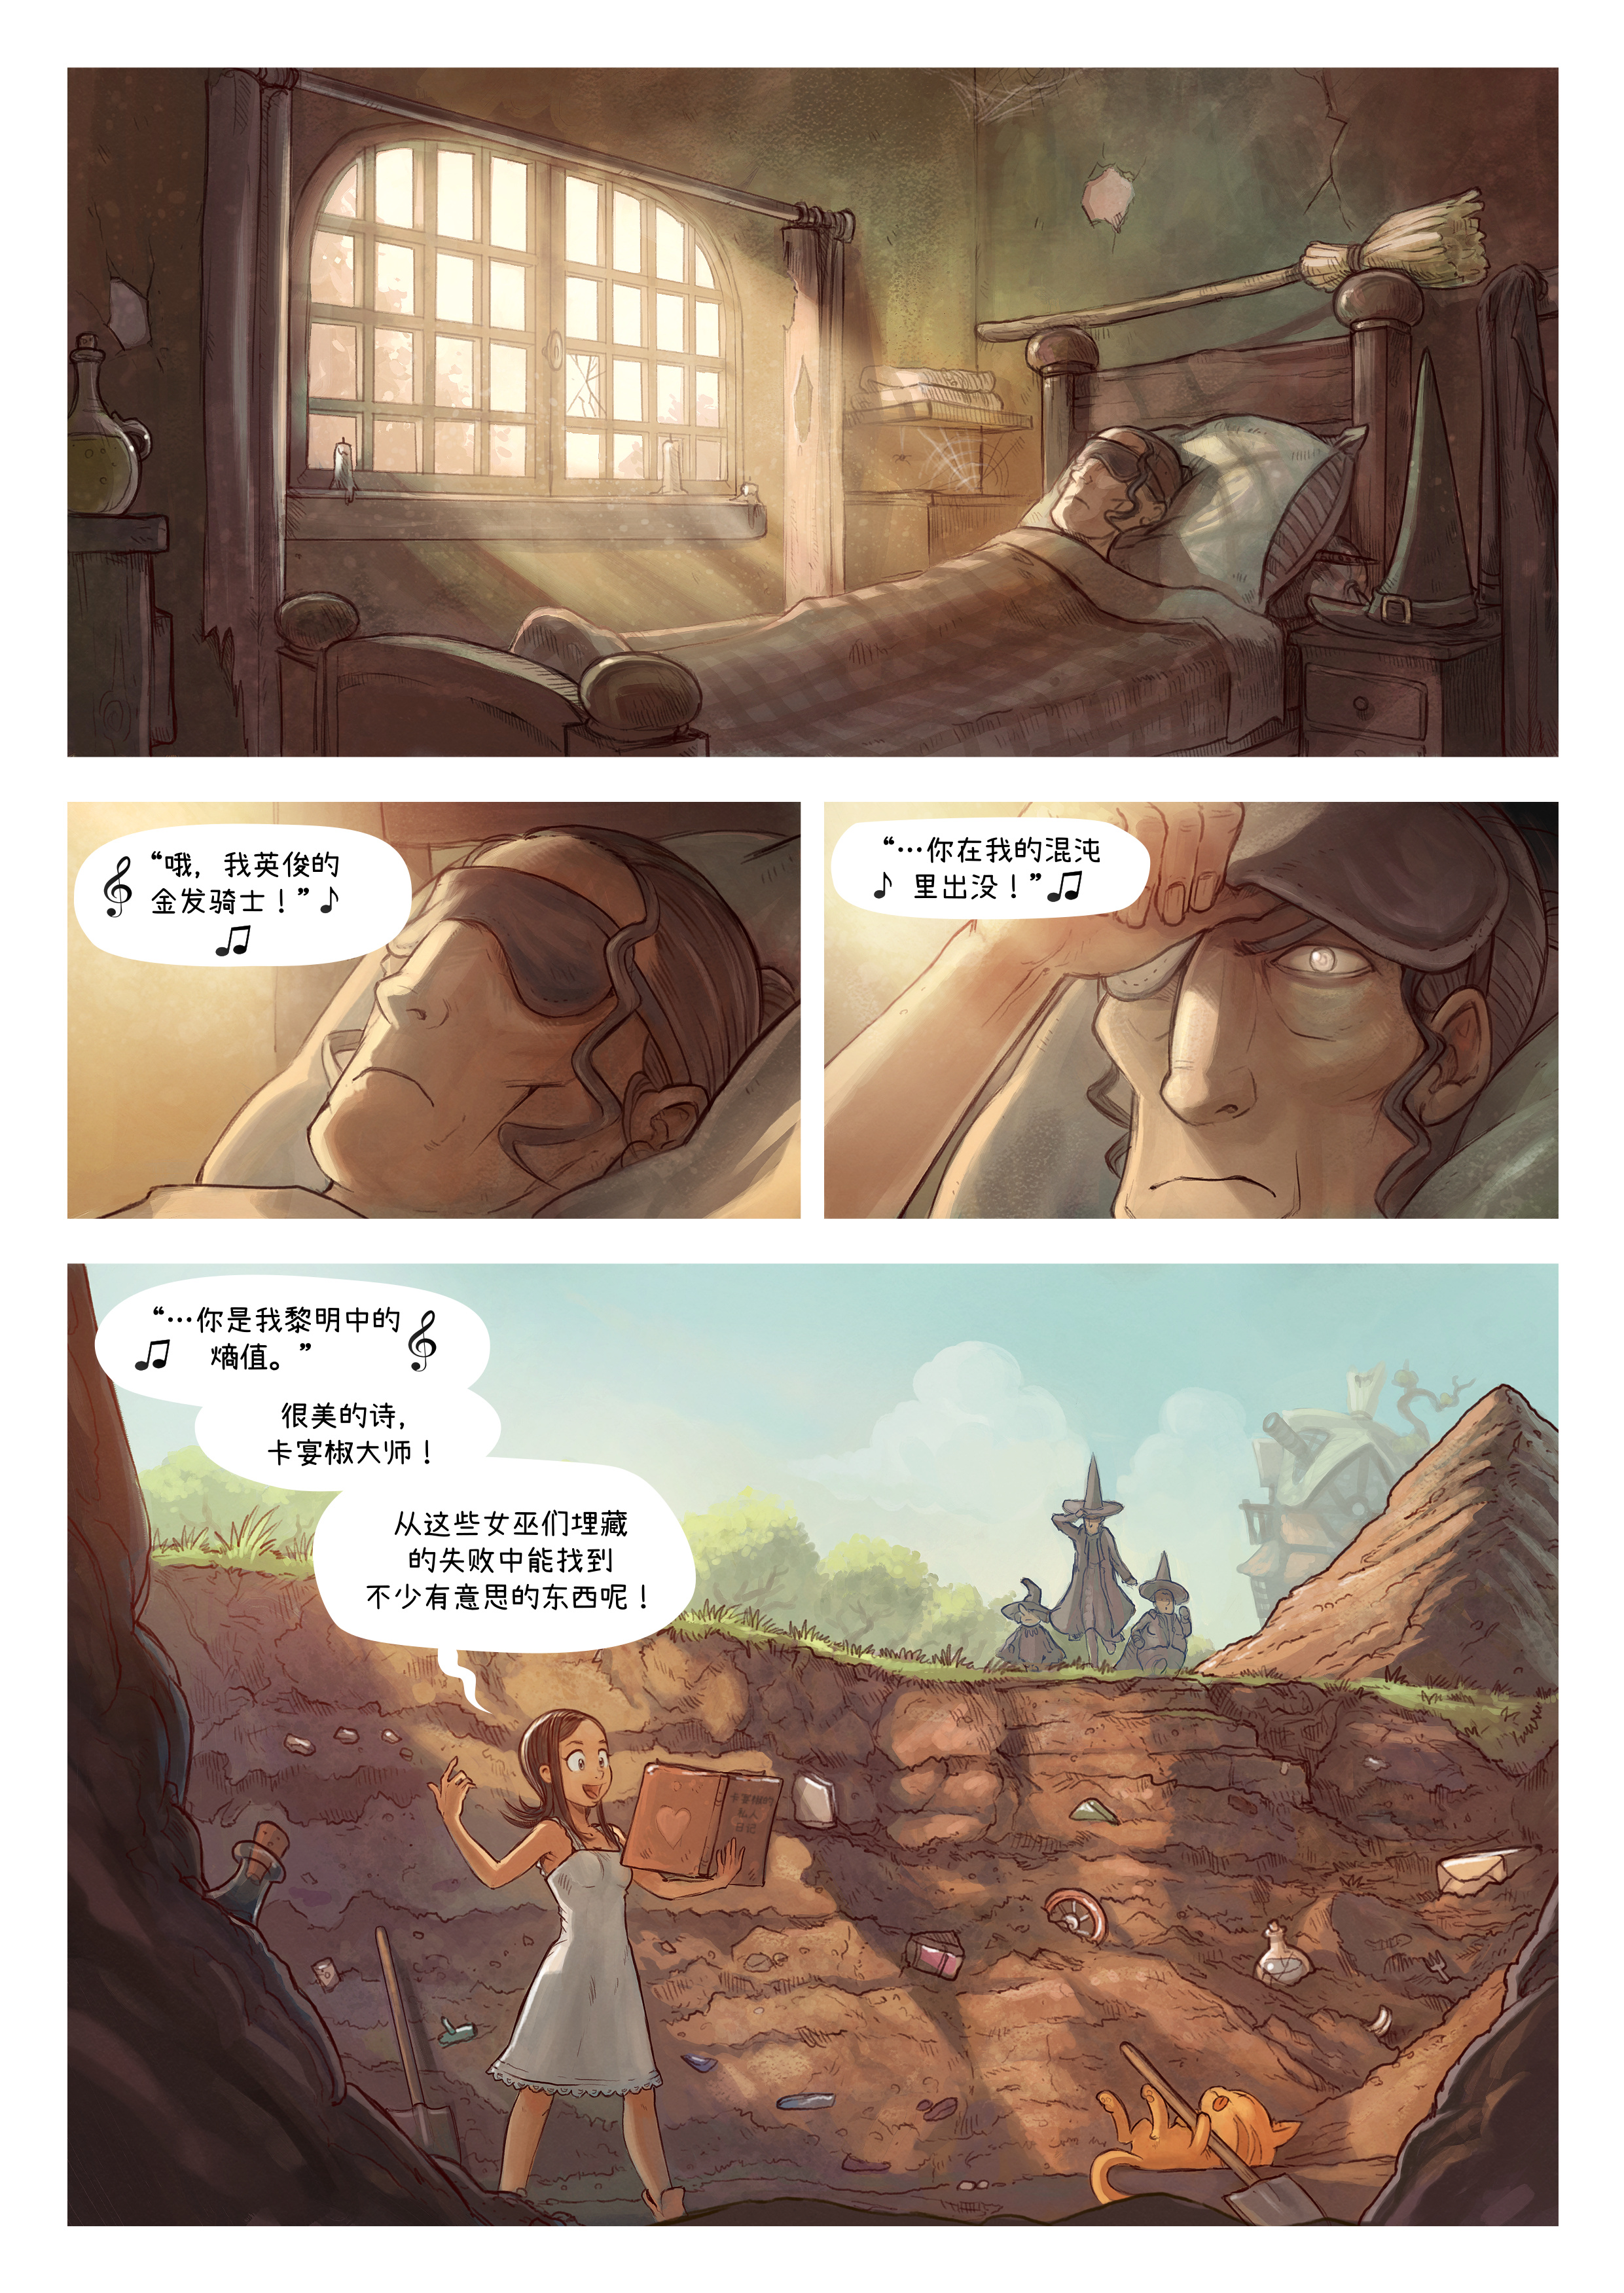 第19集:环境污染, Page 4